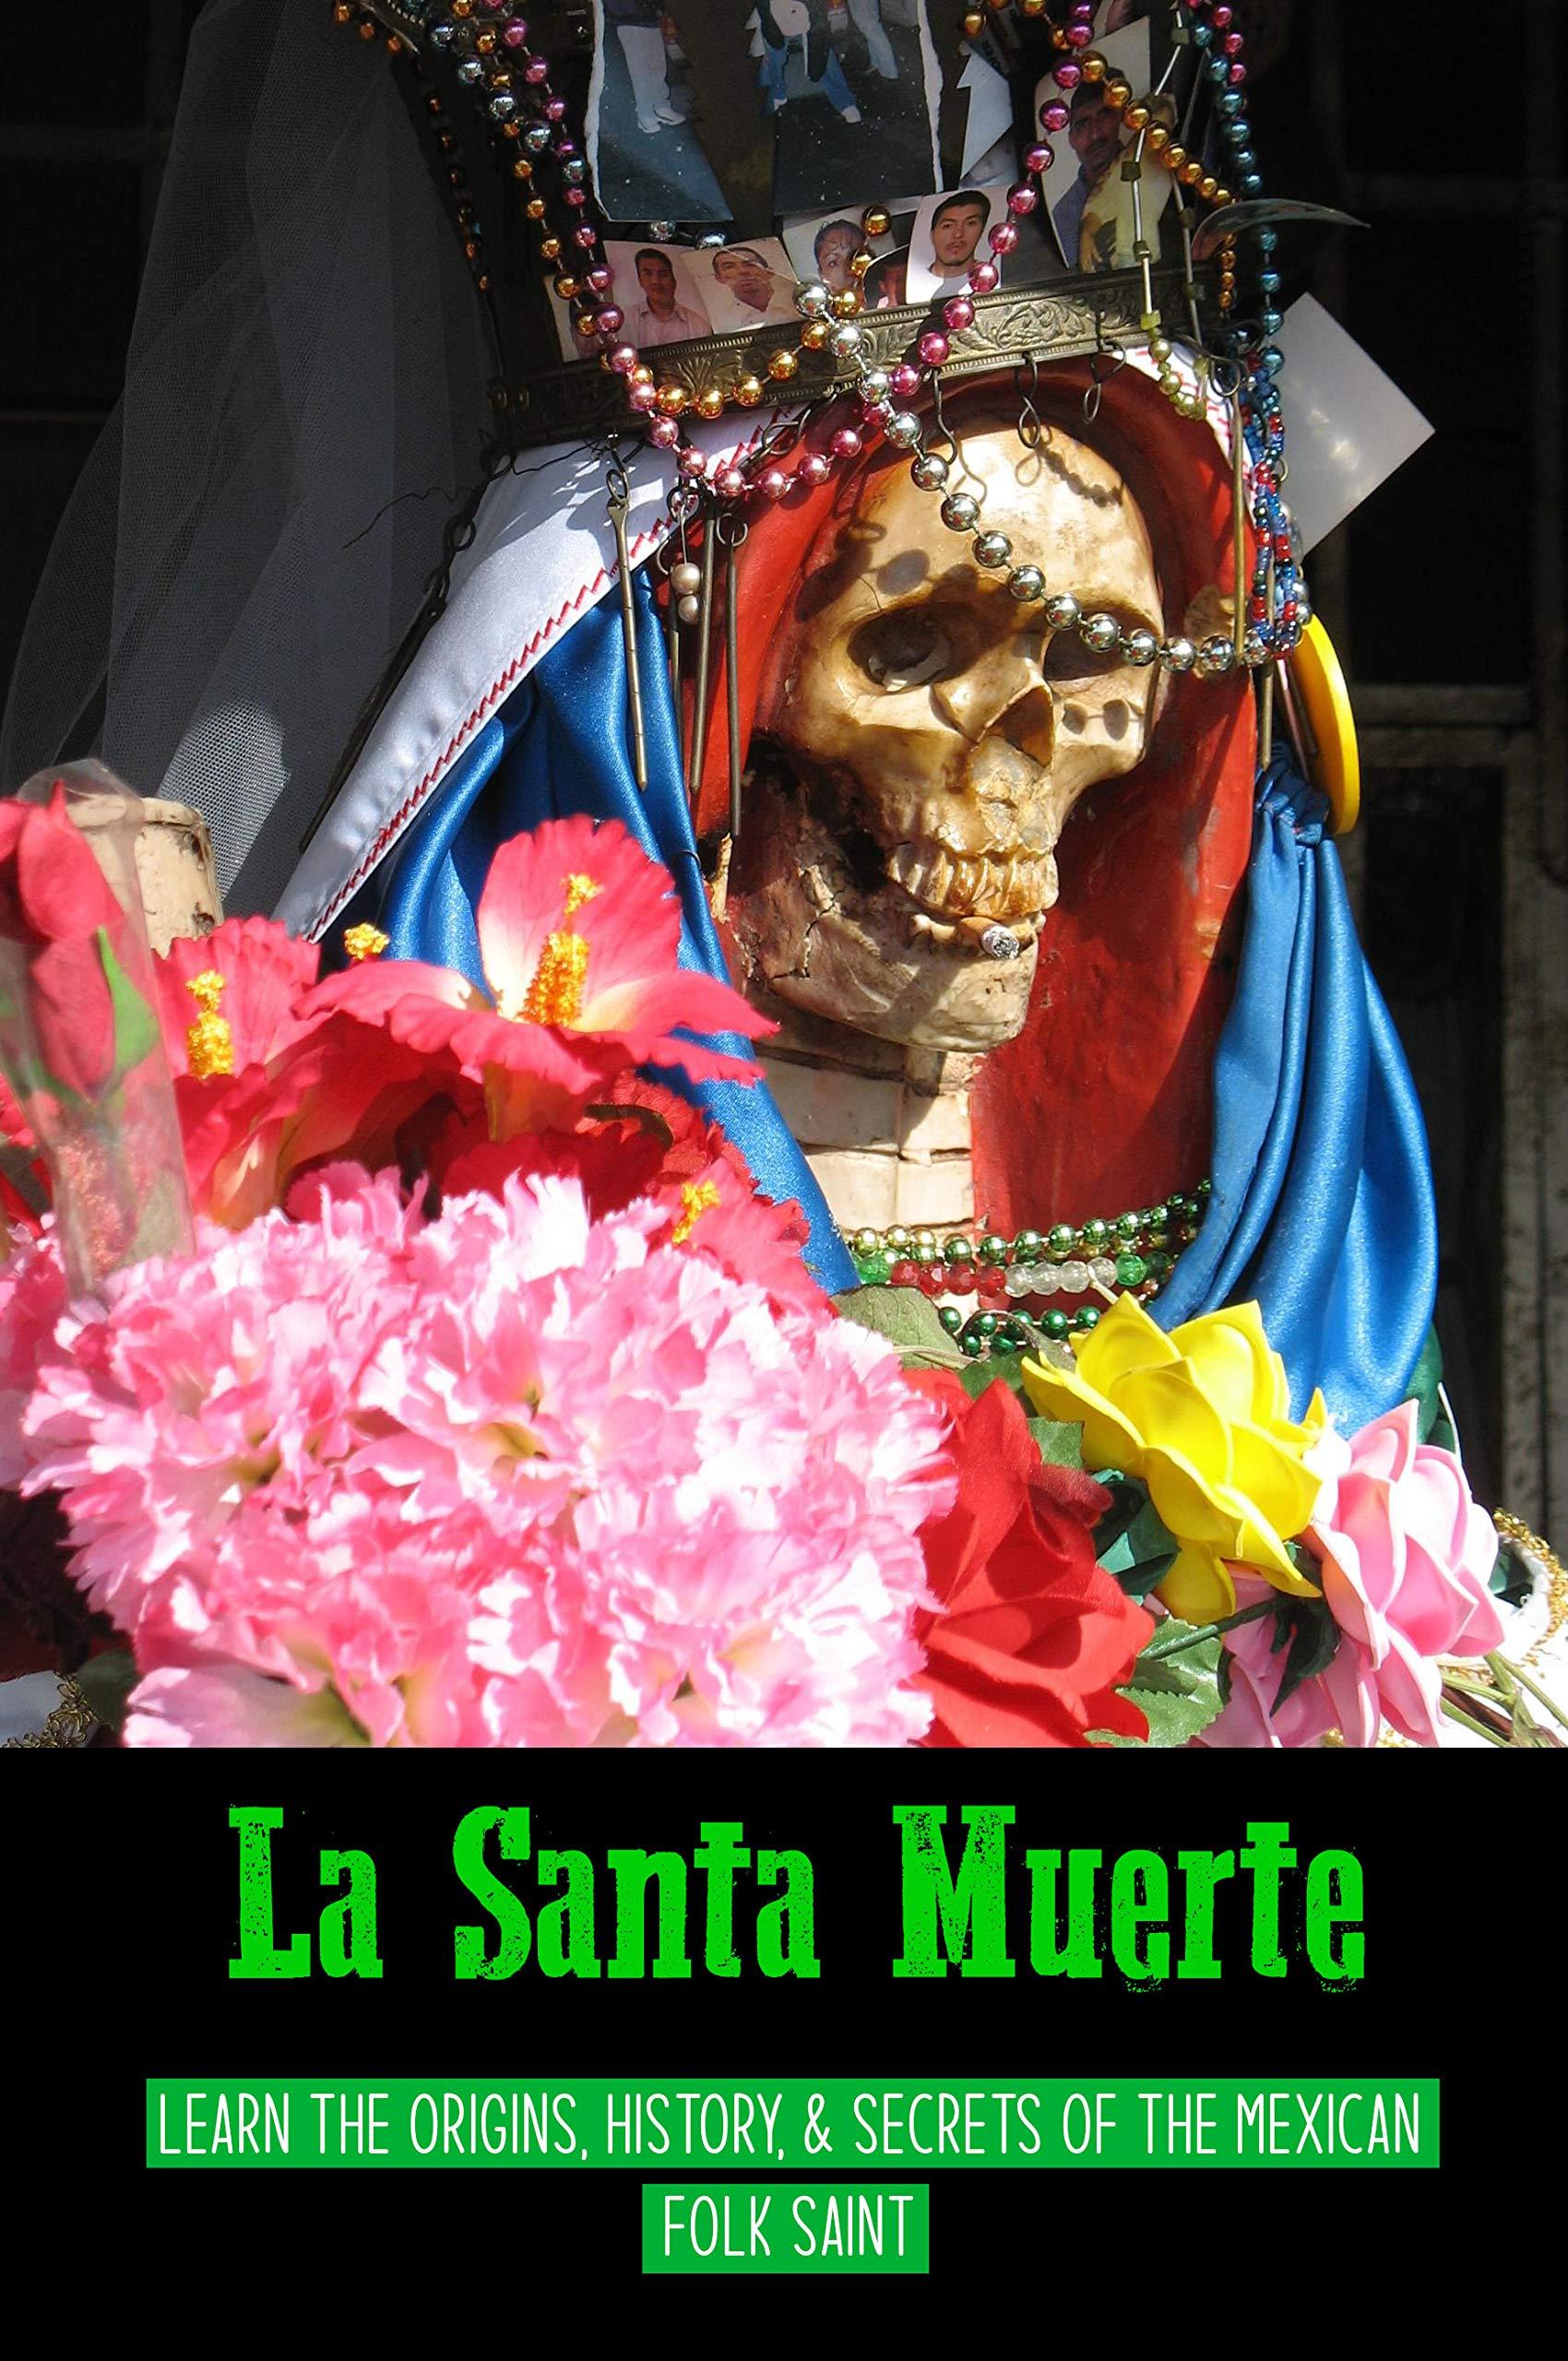 La Santa Muerte: Learn The Origins, History, & Secrets Of The Mexican Folk Saint: Story Of Santa Muerte